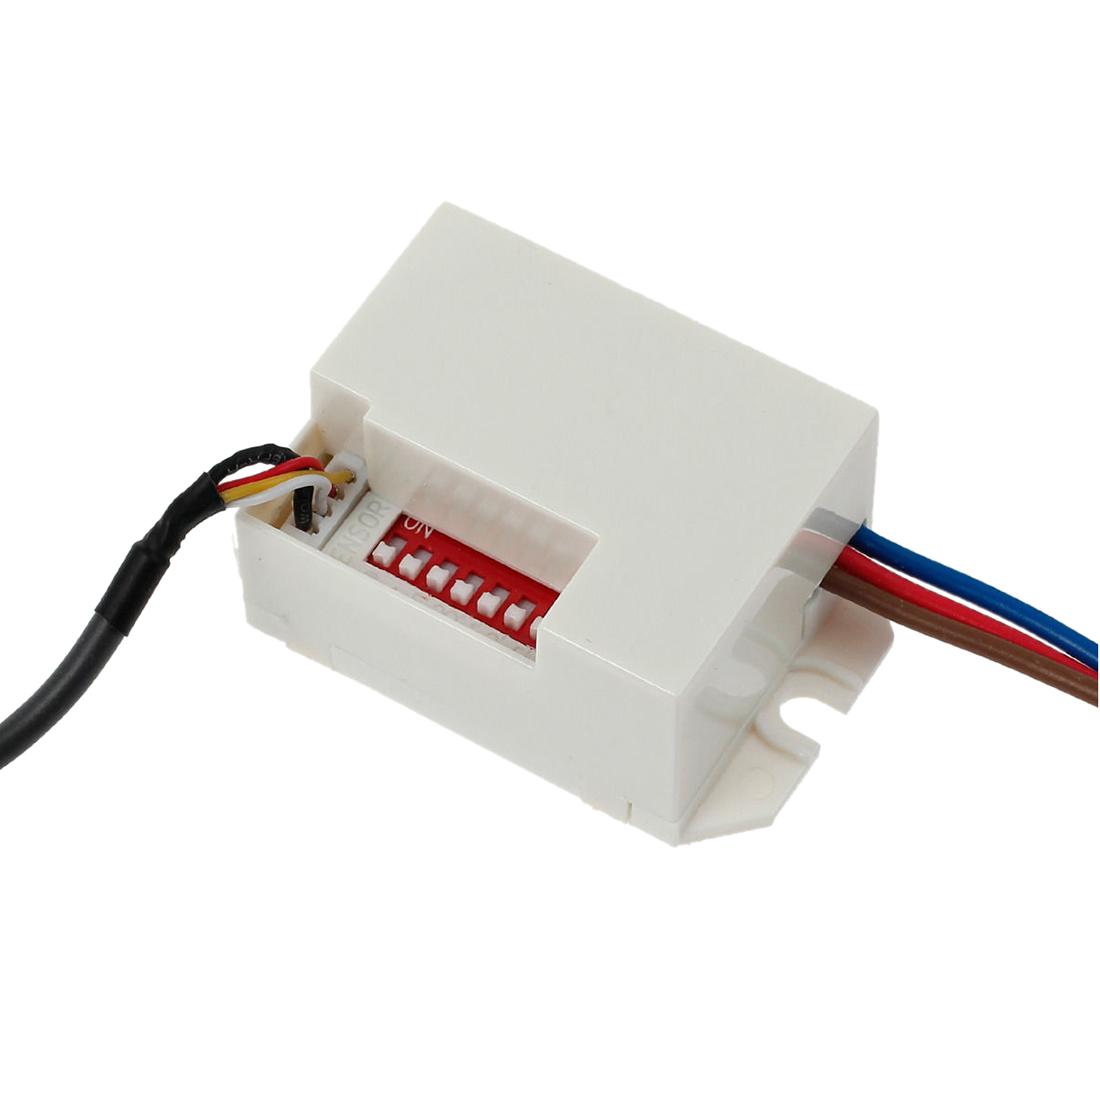 Installing Recessed Lighting Switch: 360 Degree Recessed PIR Sensor Detector Ceiling Occupancy